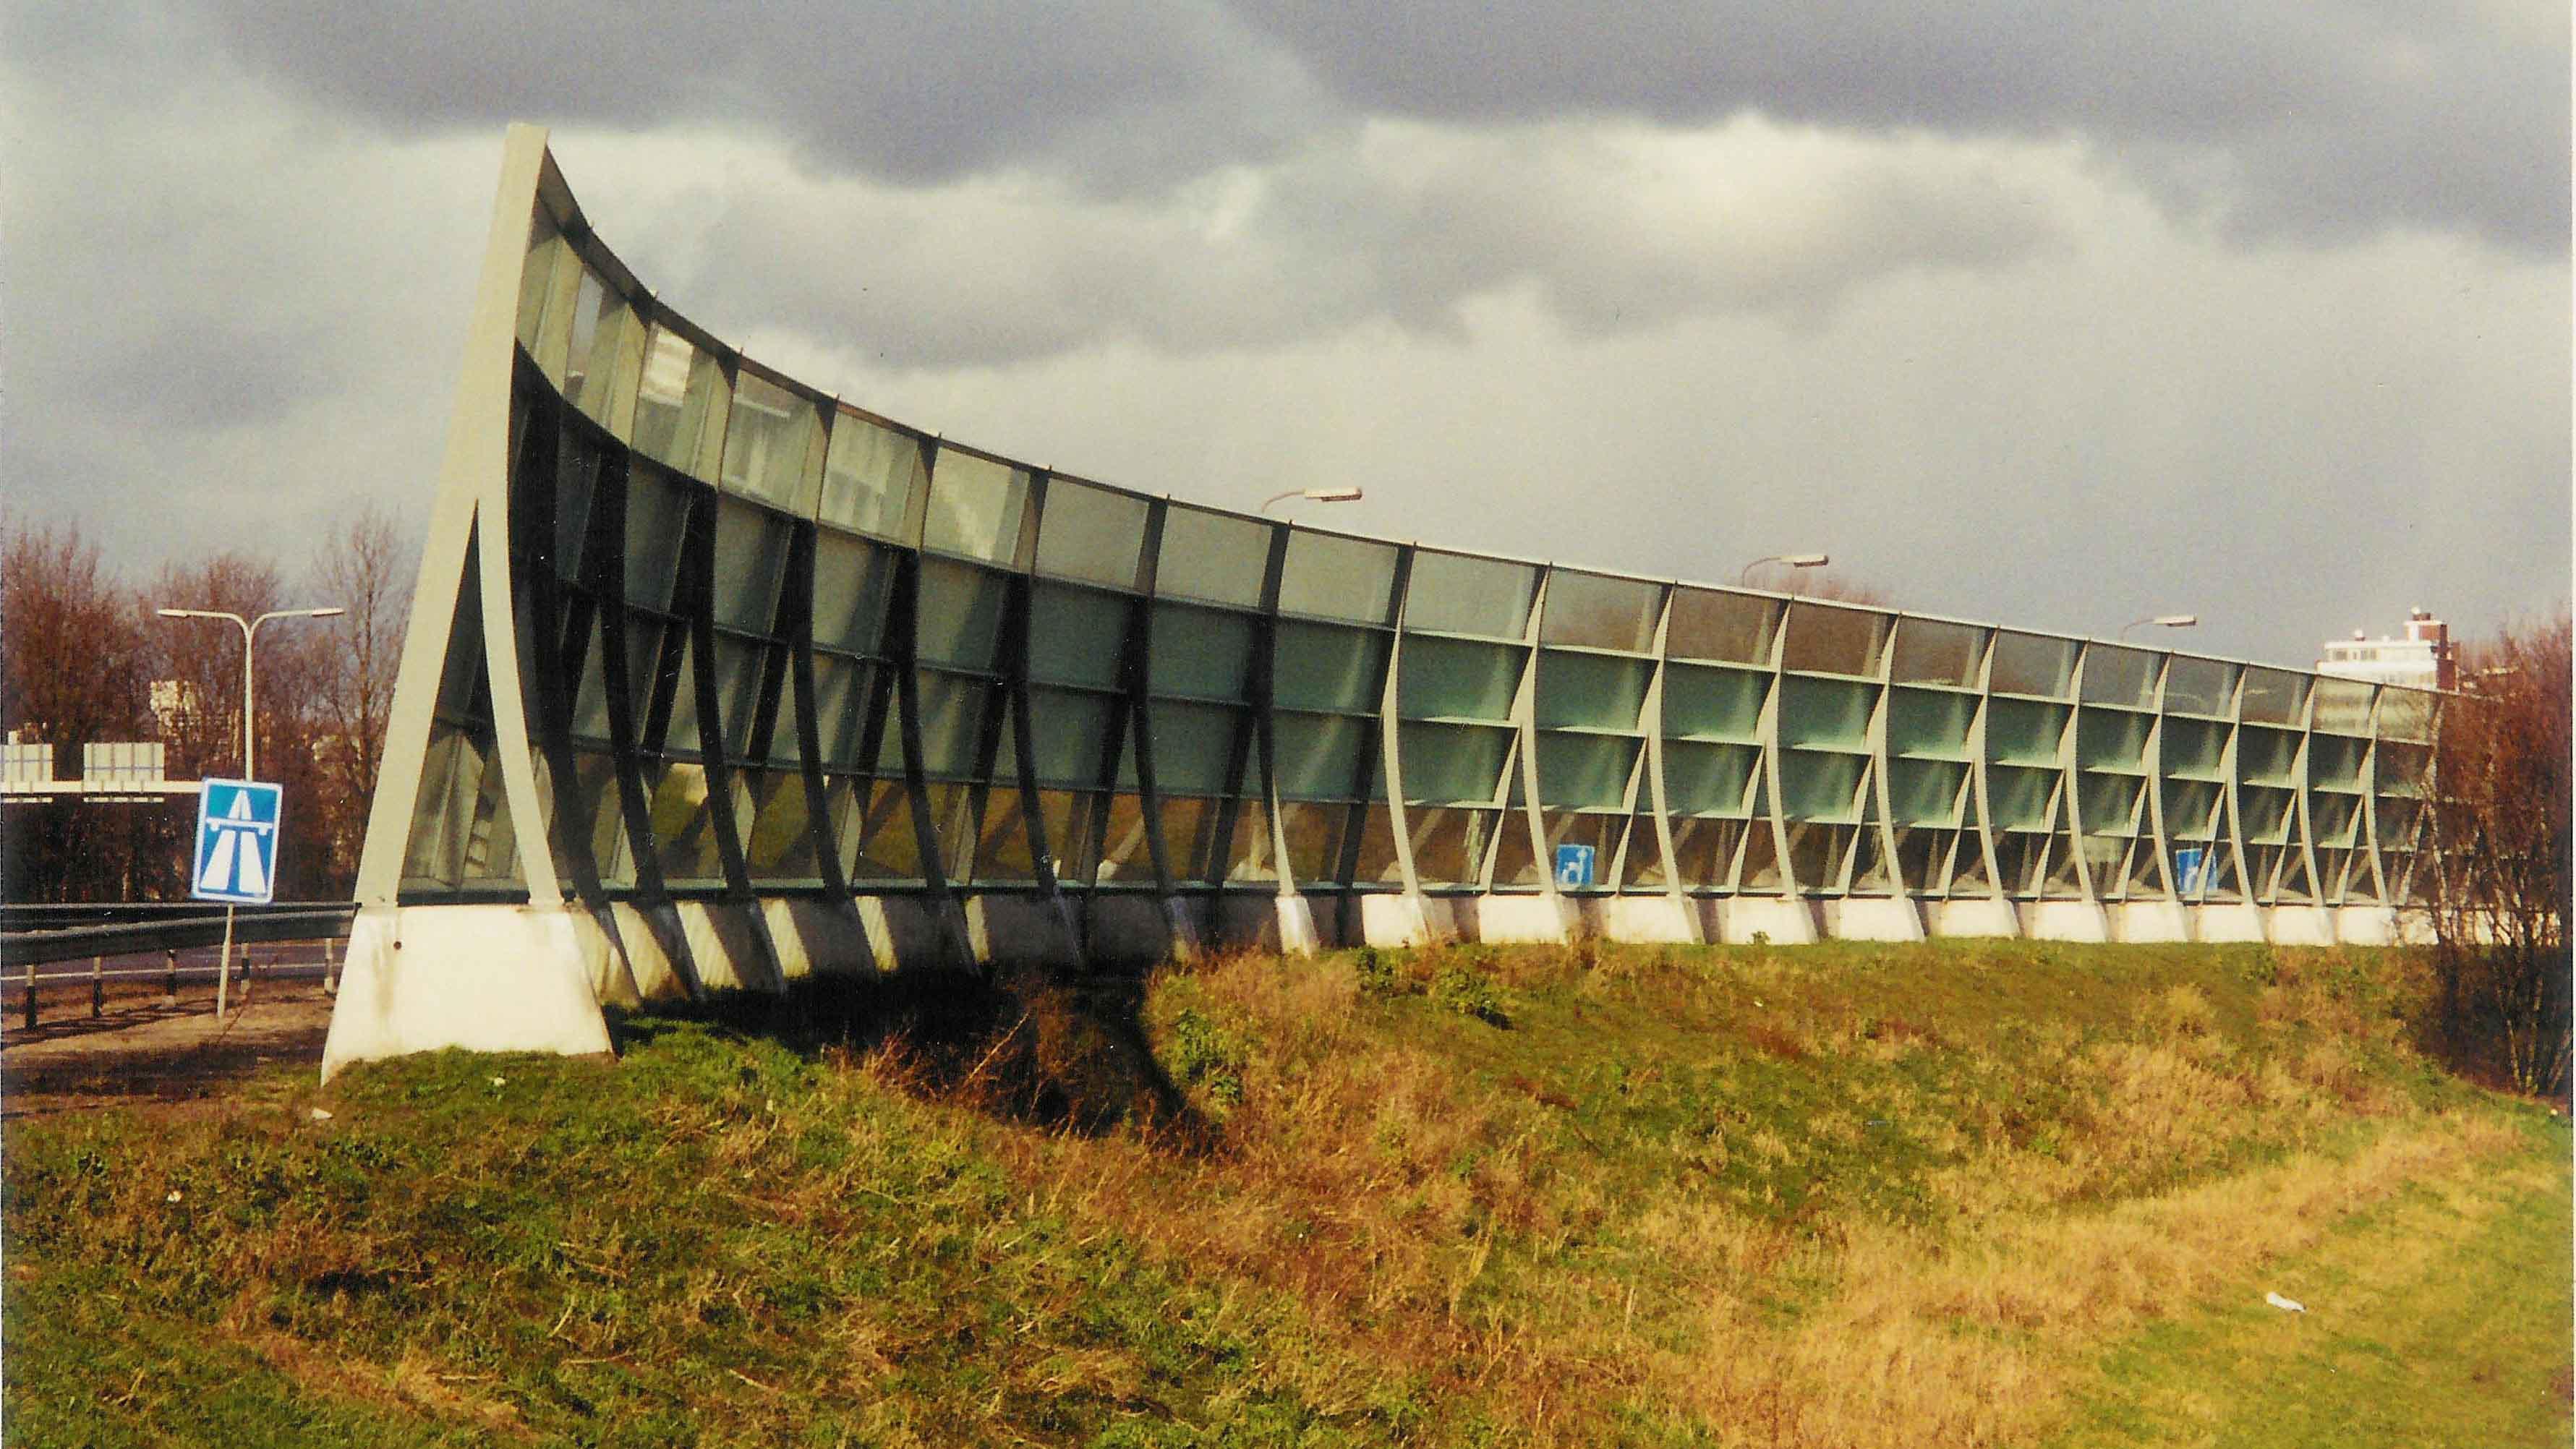 geluidsscherm A13 delft pijnacker architect marja haring